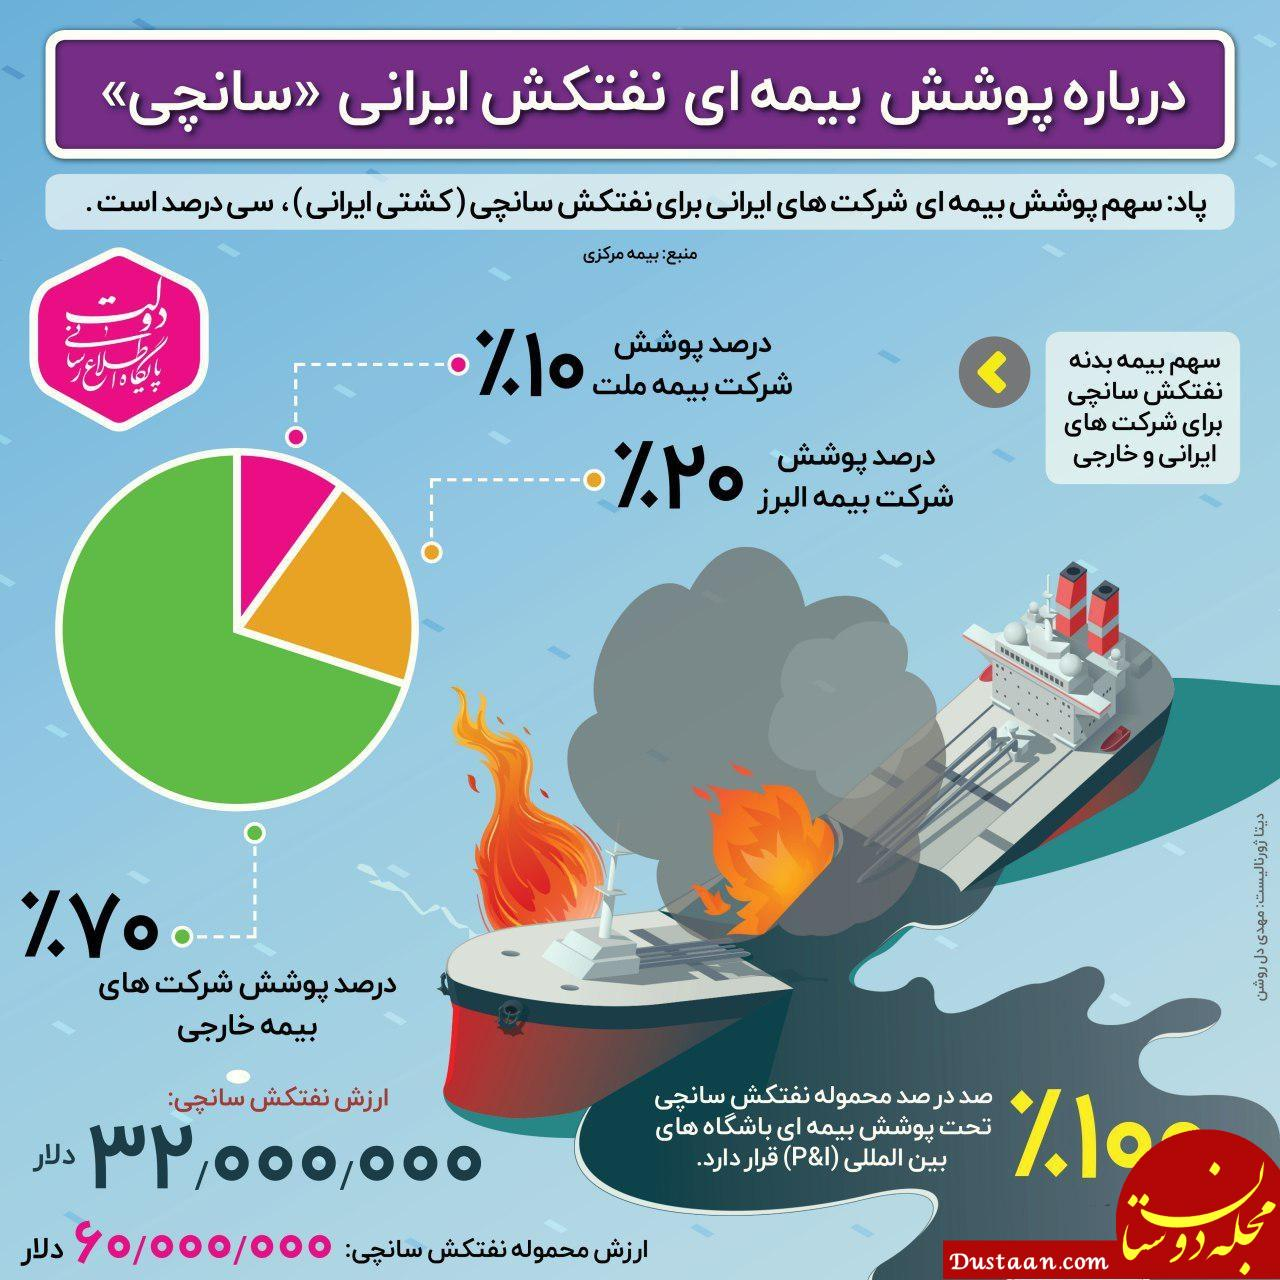 www.dustaan.com پوشش بیمه ای نفتکش ایرانی سانچی +عکس